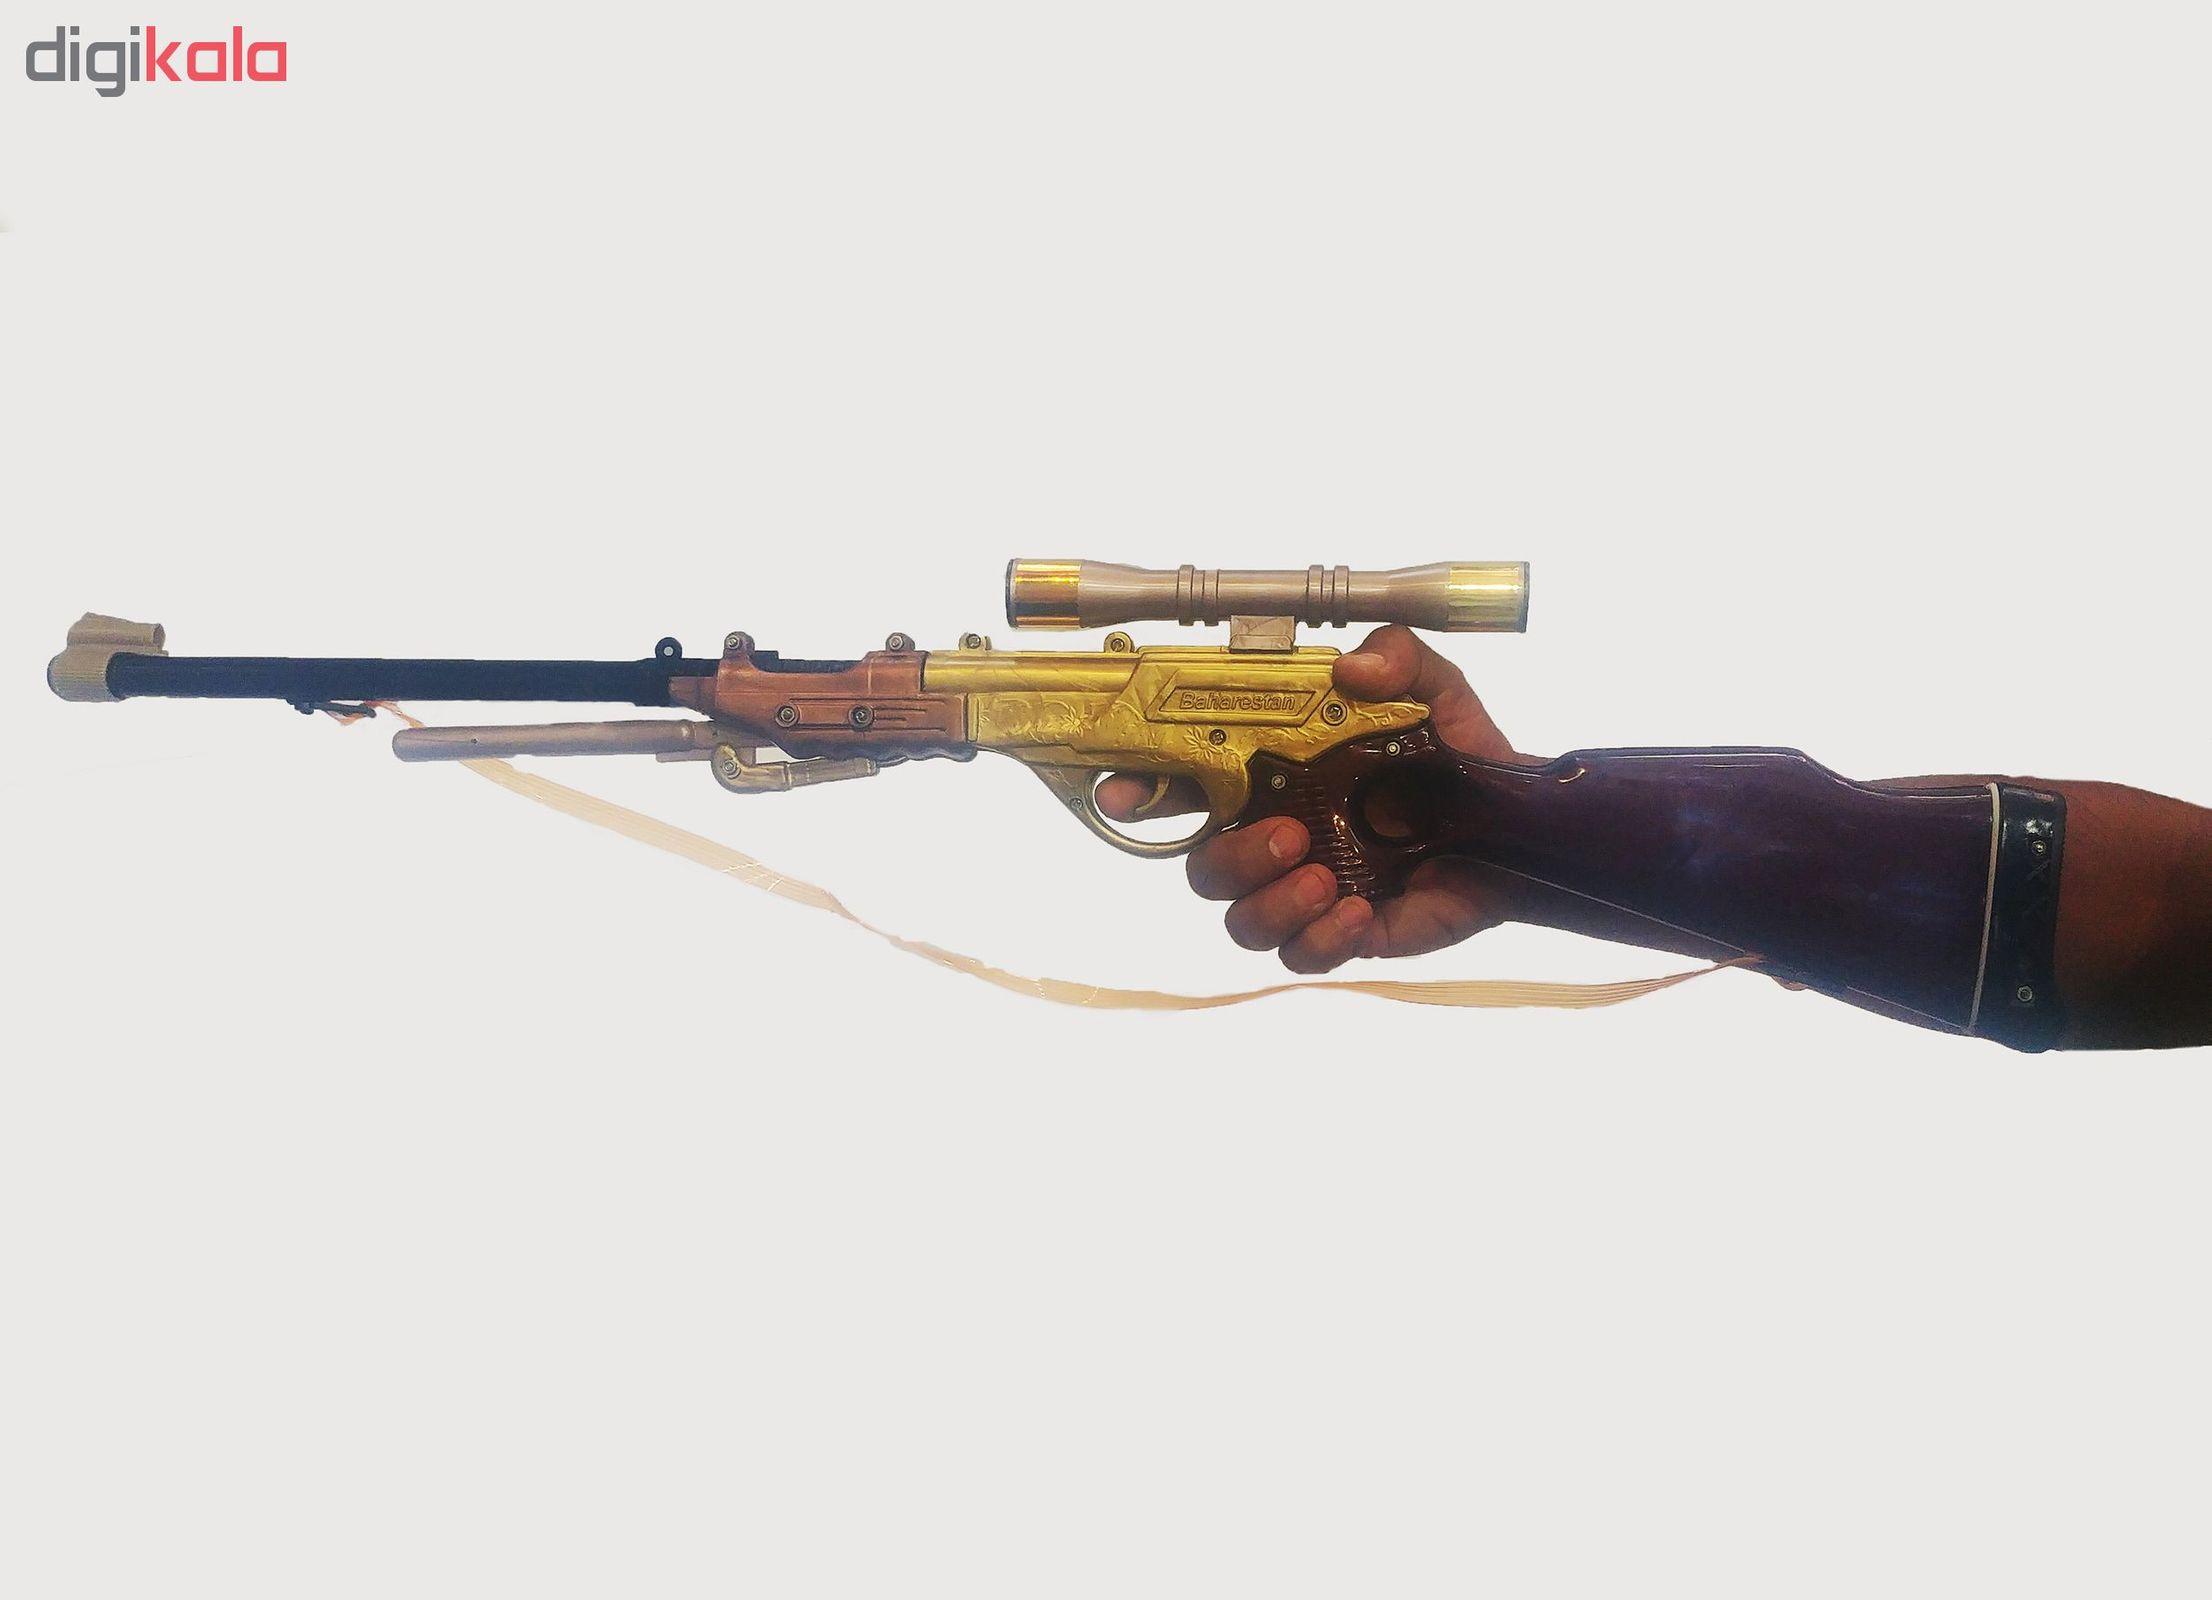 تفنگ بازی مدل Hornet 168 main 1 3